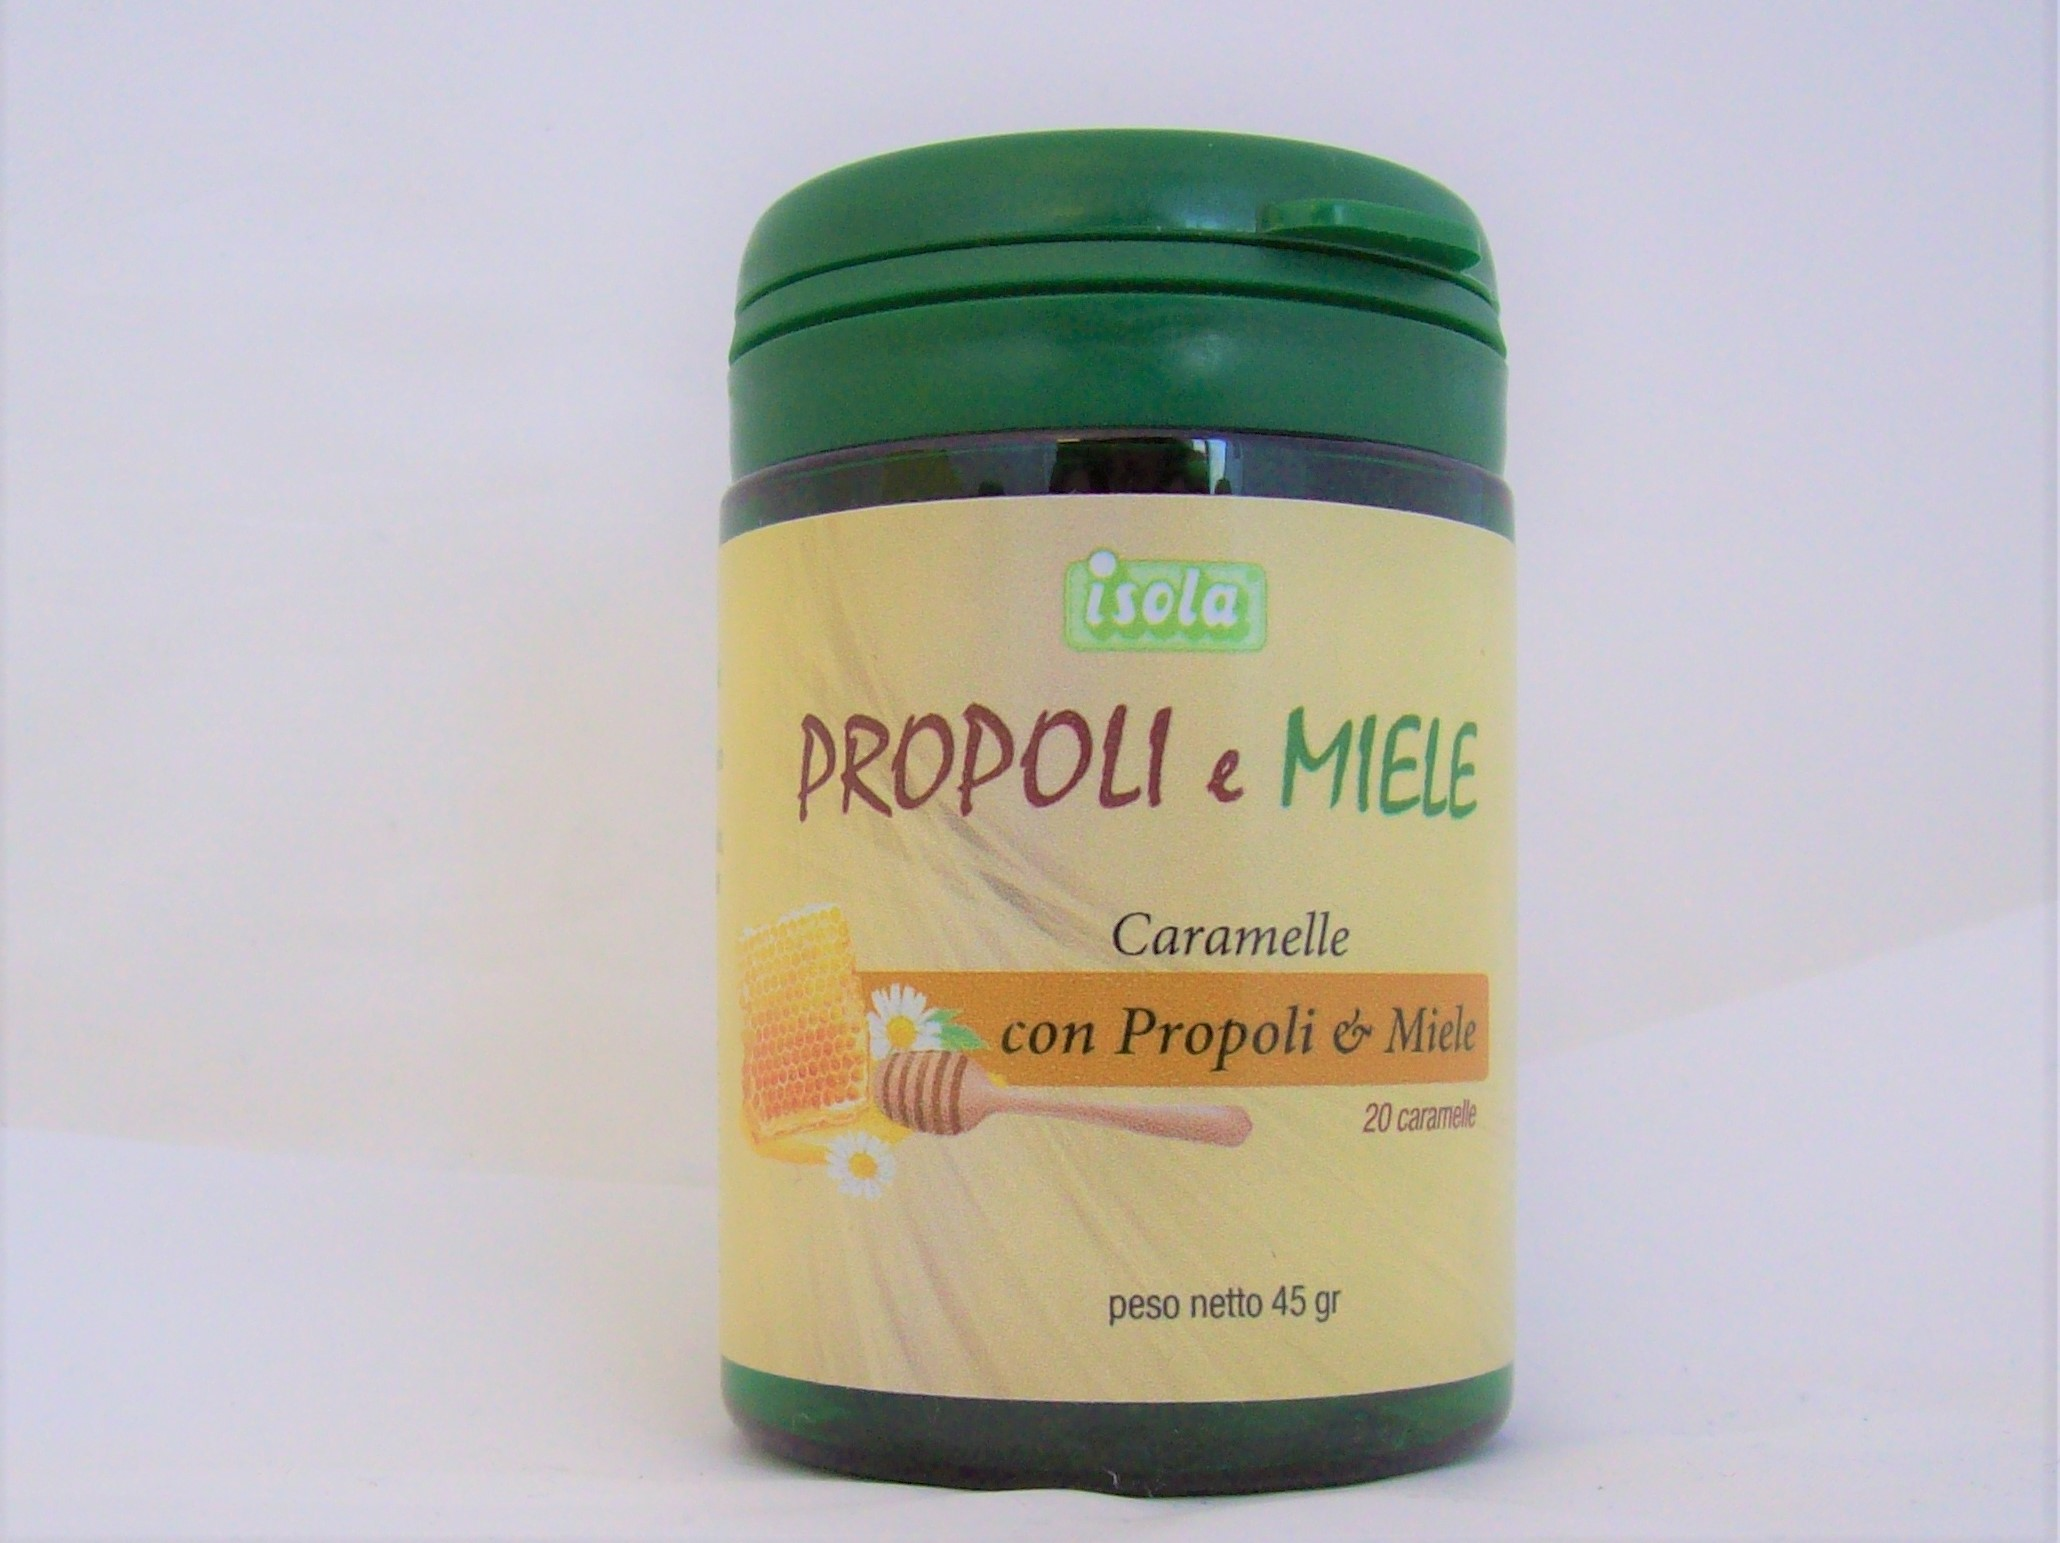 Caramelle Propoli e Miele 20 caramelle